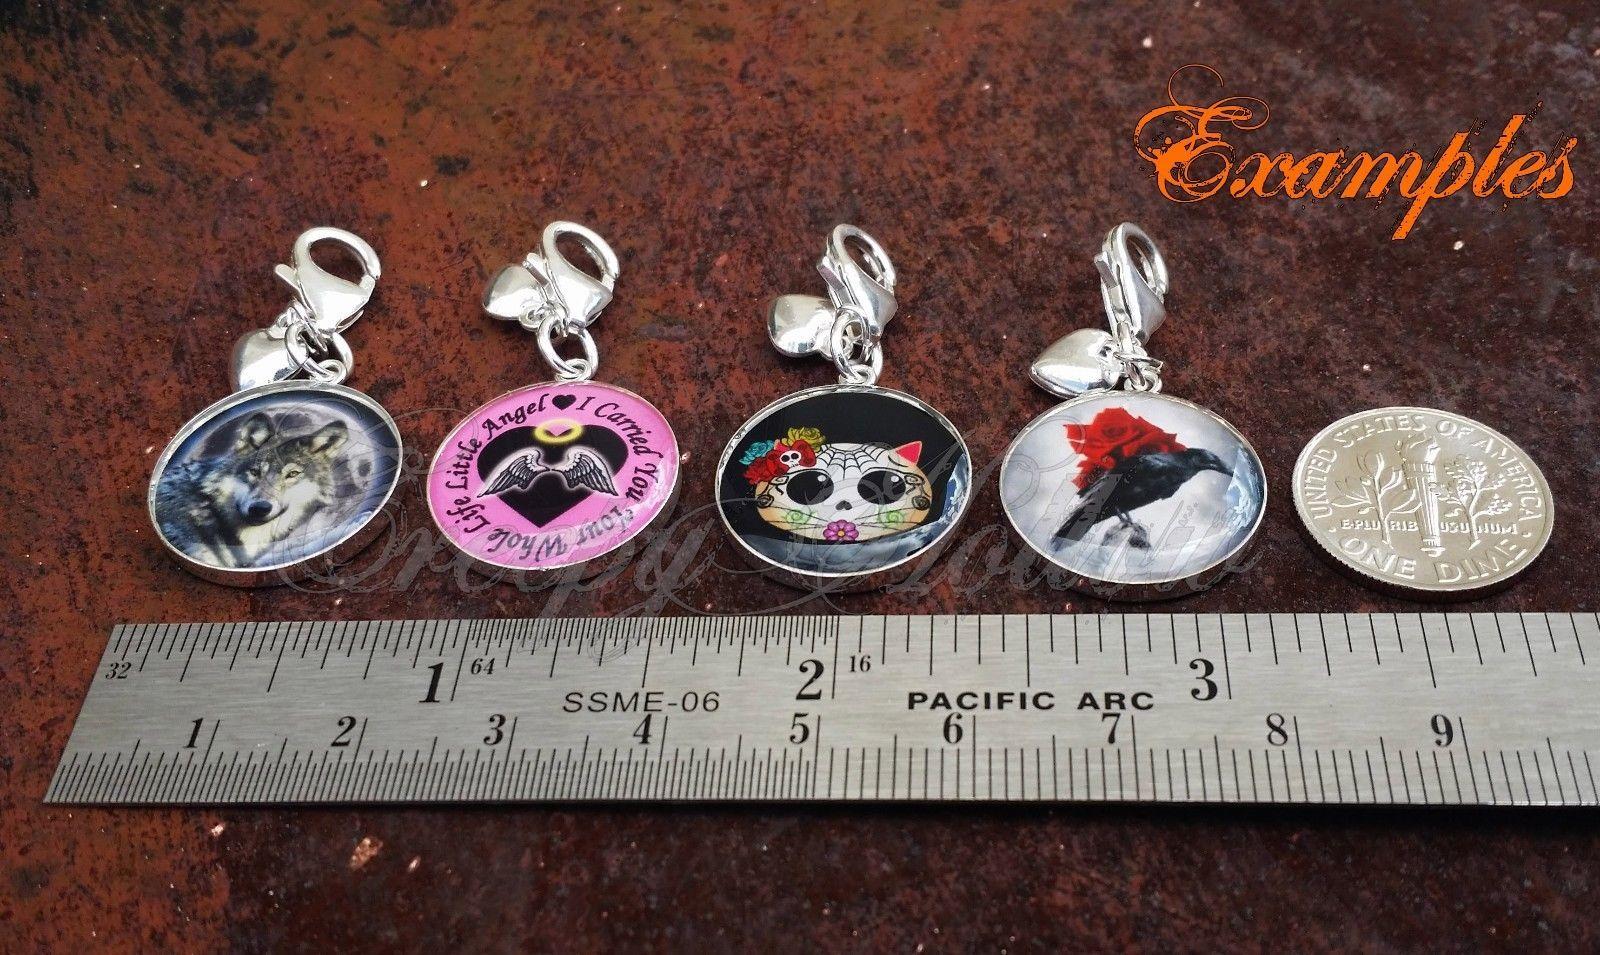 925 Sterling Silver Charm Broken Heart Stitched Together Emo Love image 3